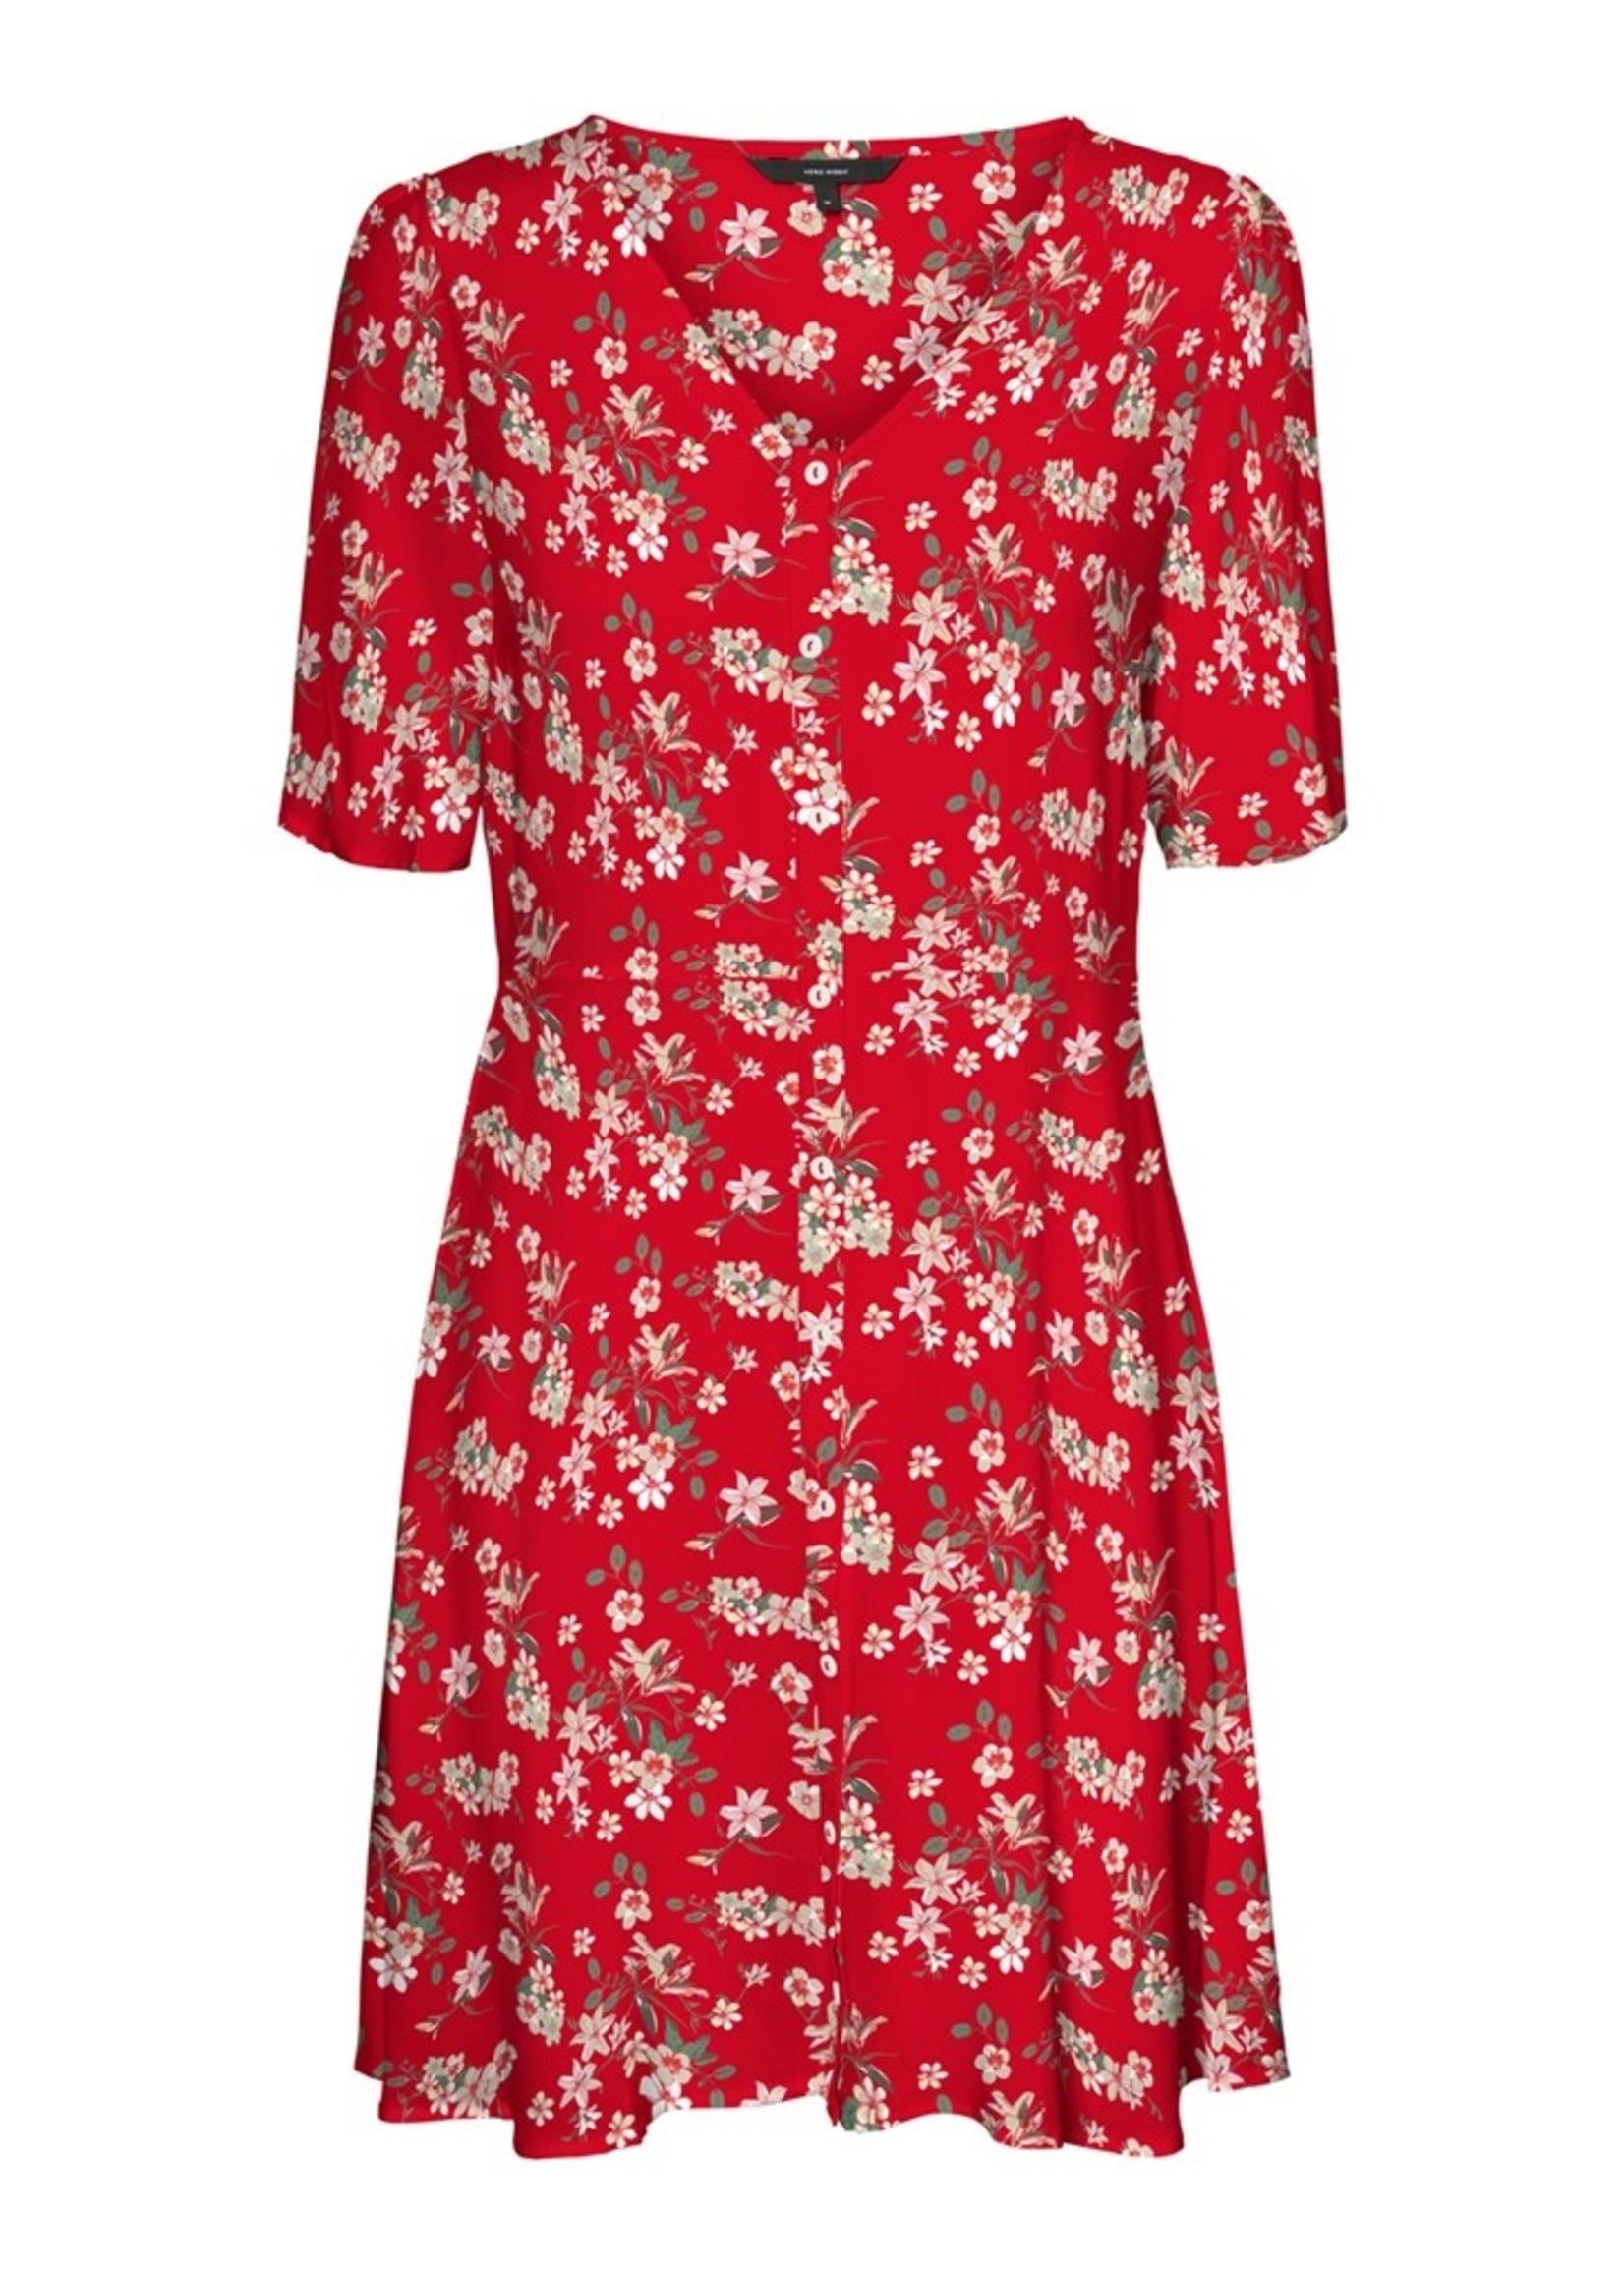 Vero Moda VERO MODA RED FLORAL DRESS